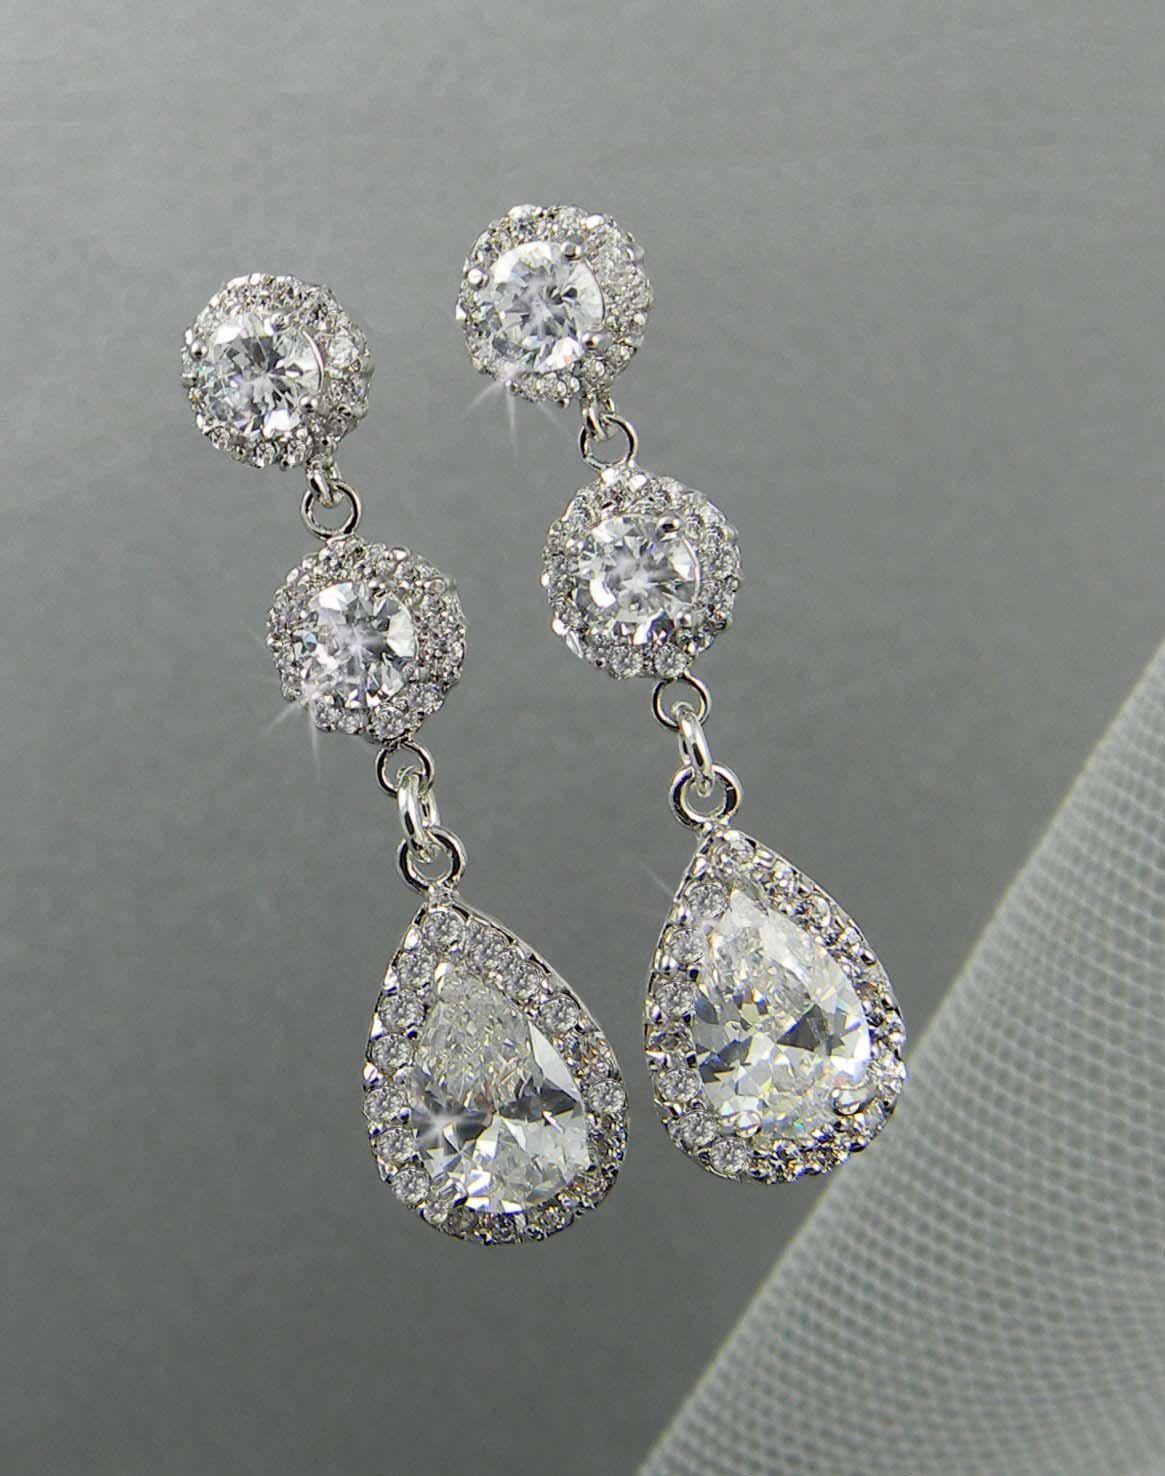 Dangle Crystal Bridal Earrings Wedding Long Bridesmaids Swarovski Jewelry Stud 44 00 Via Etsy